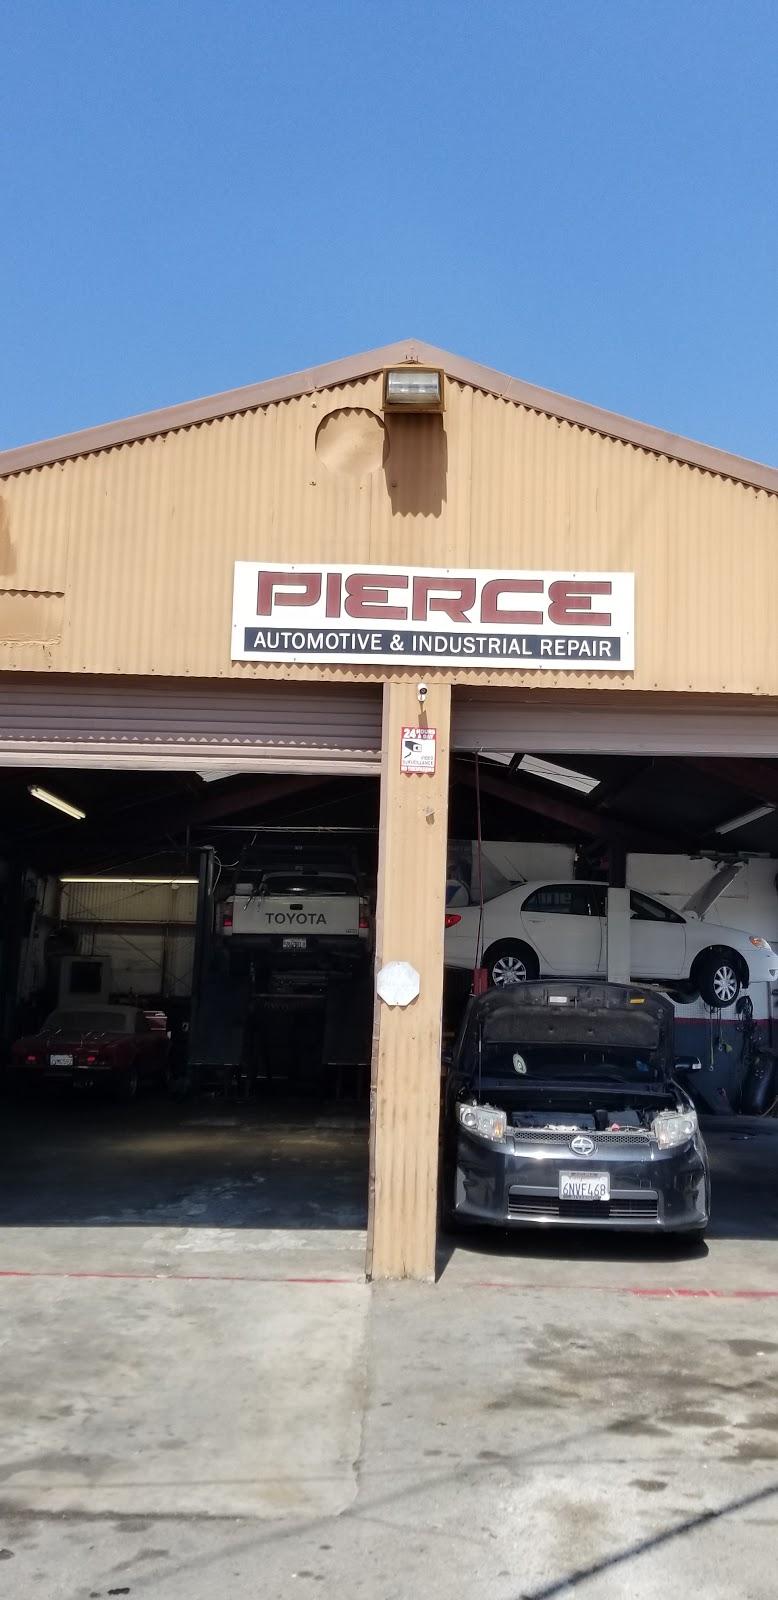 pierce automotive - car repair    Photo 8 of 10   Address: 10941 Hole Ave, Riverside, CA 92505, USA   Phone: (951) 637-6841